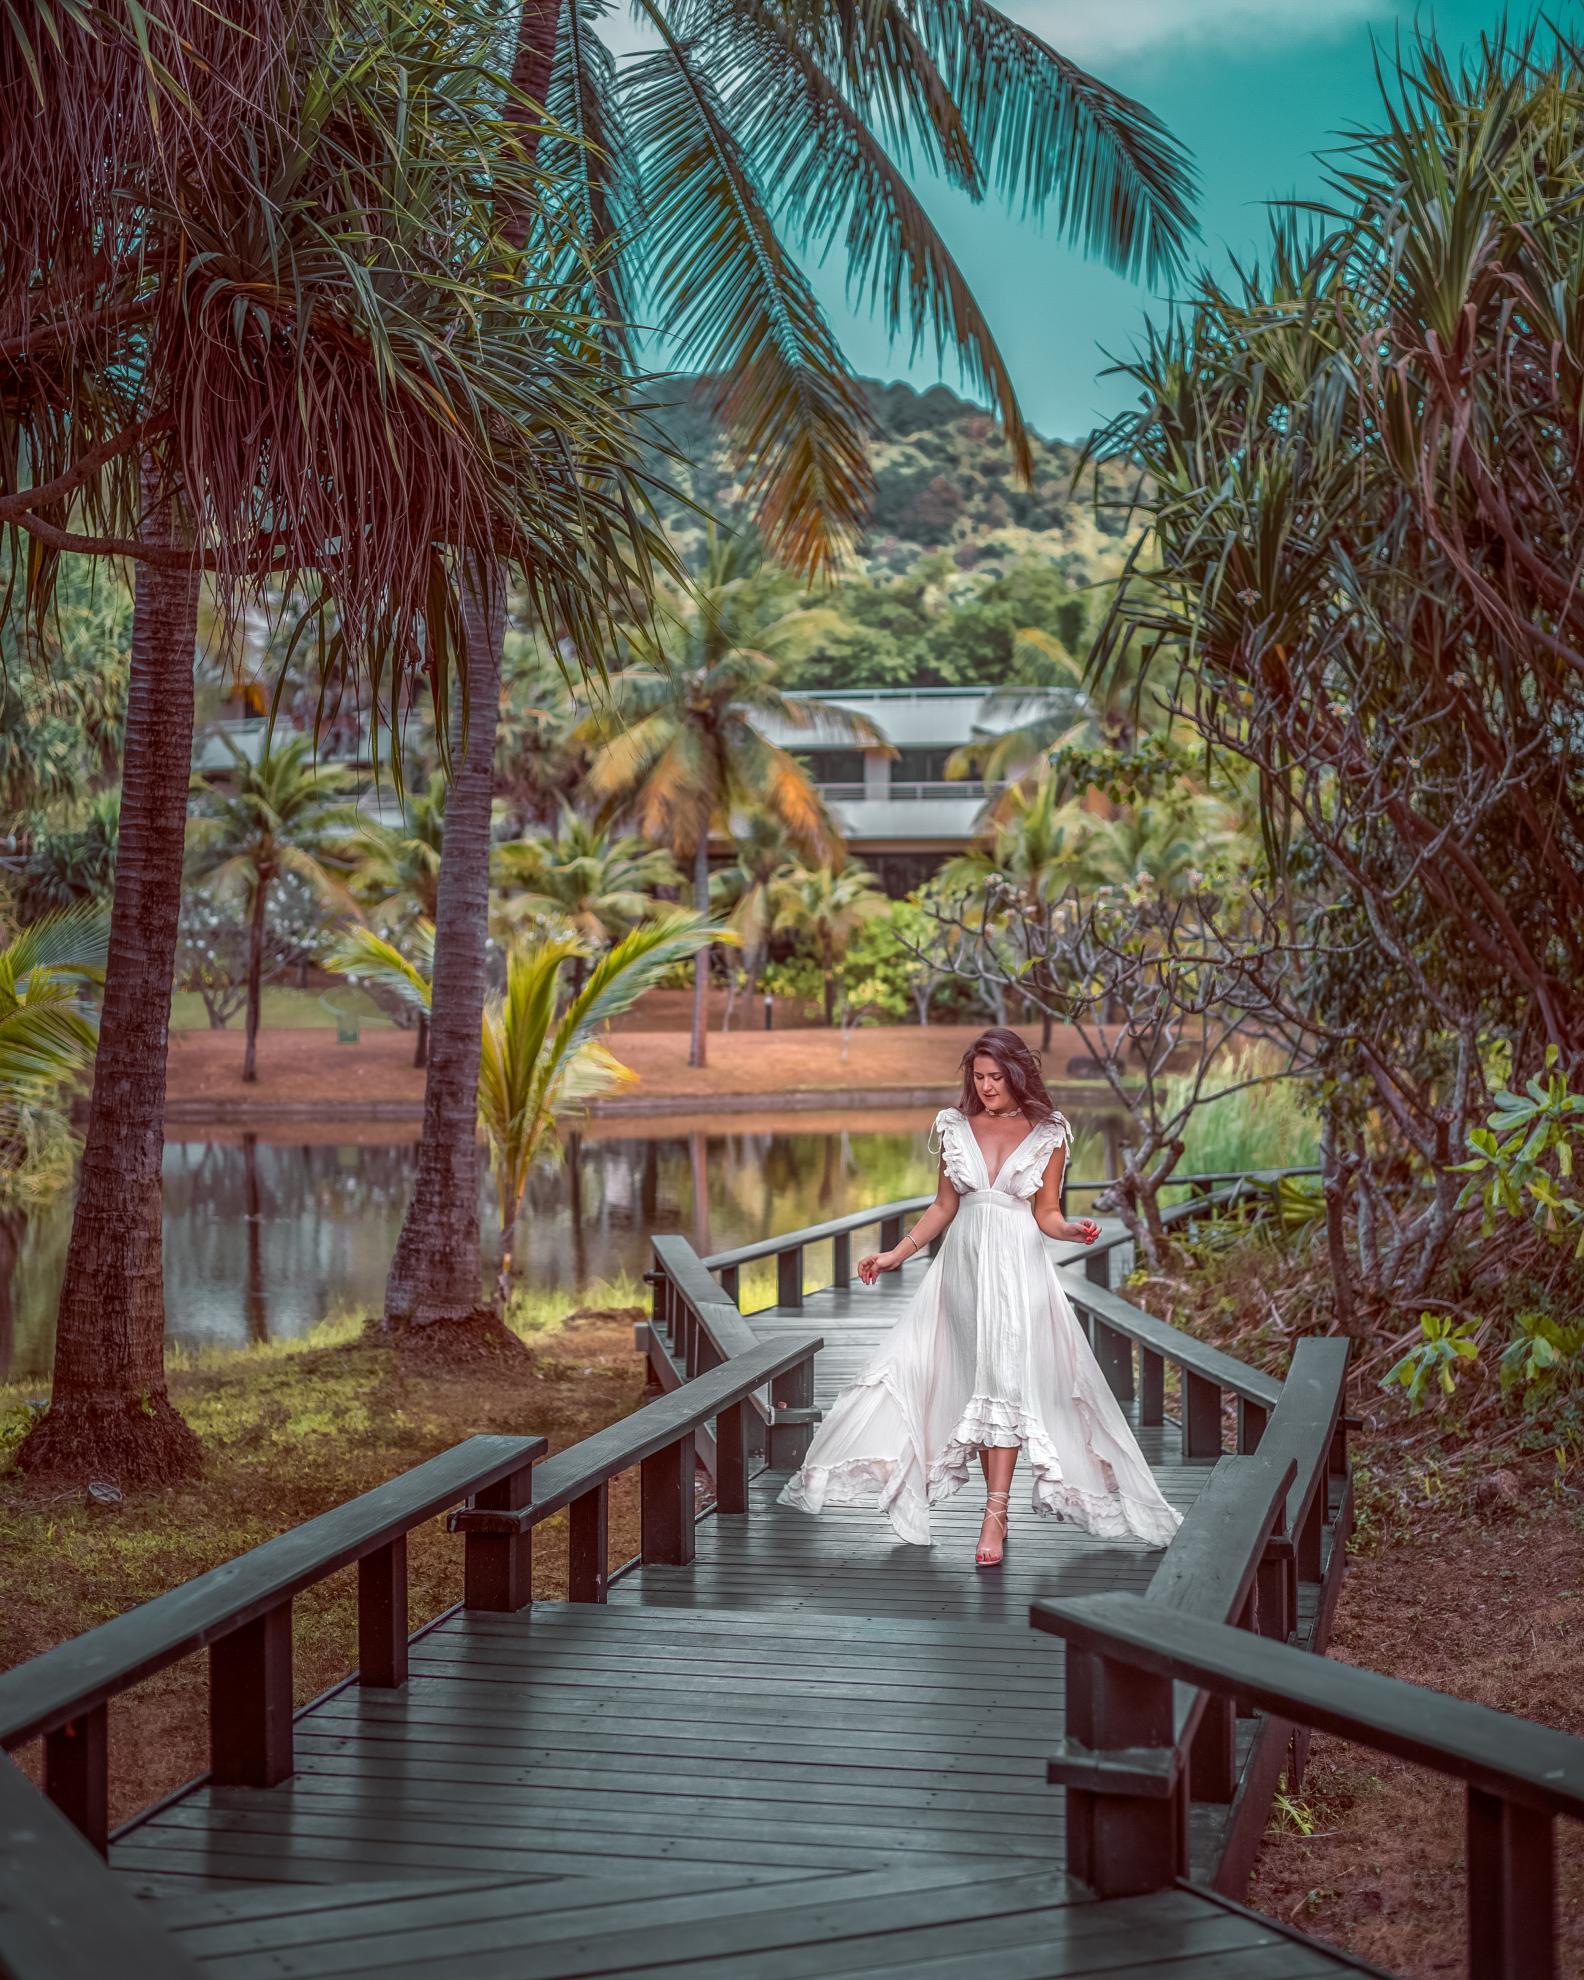 Hilton Phuket Arcadia Resort&SPA review